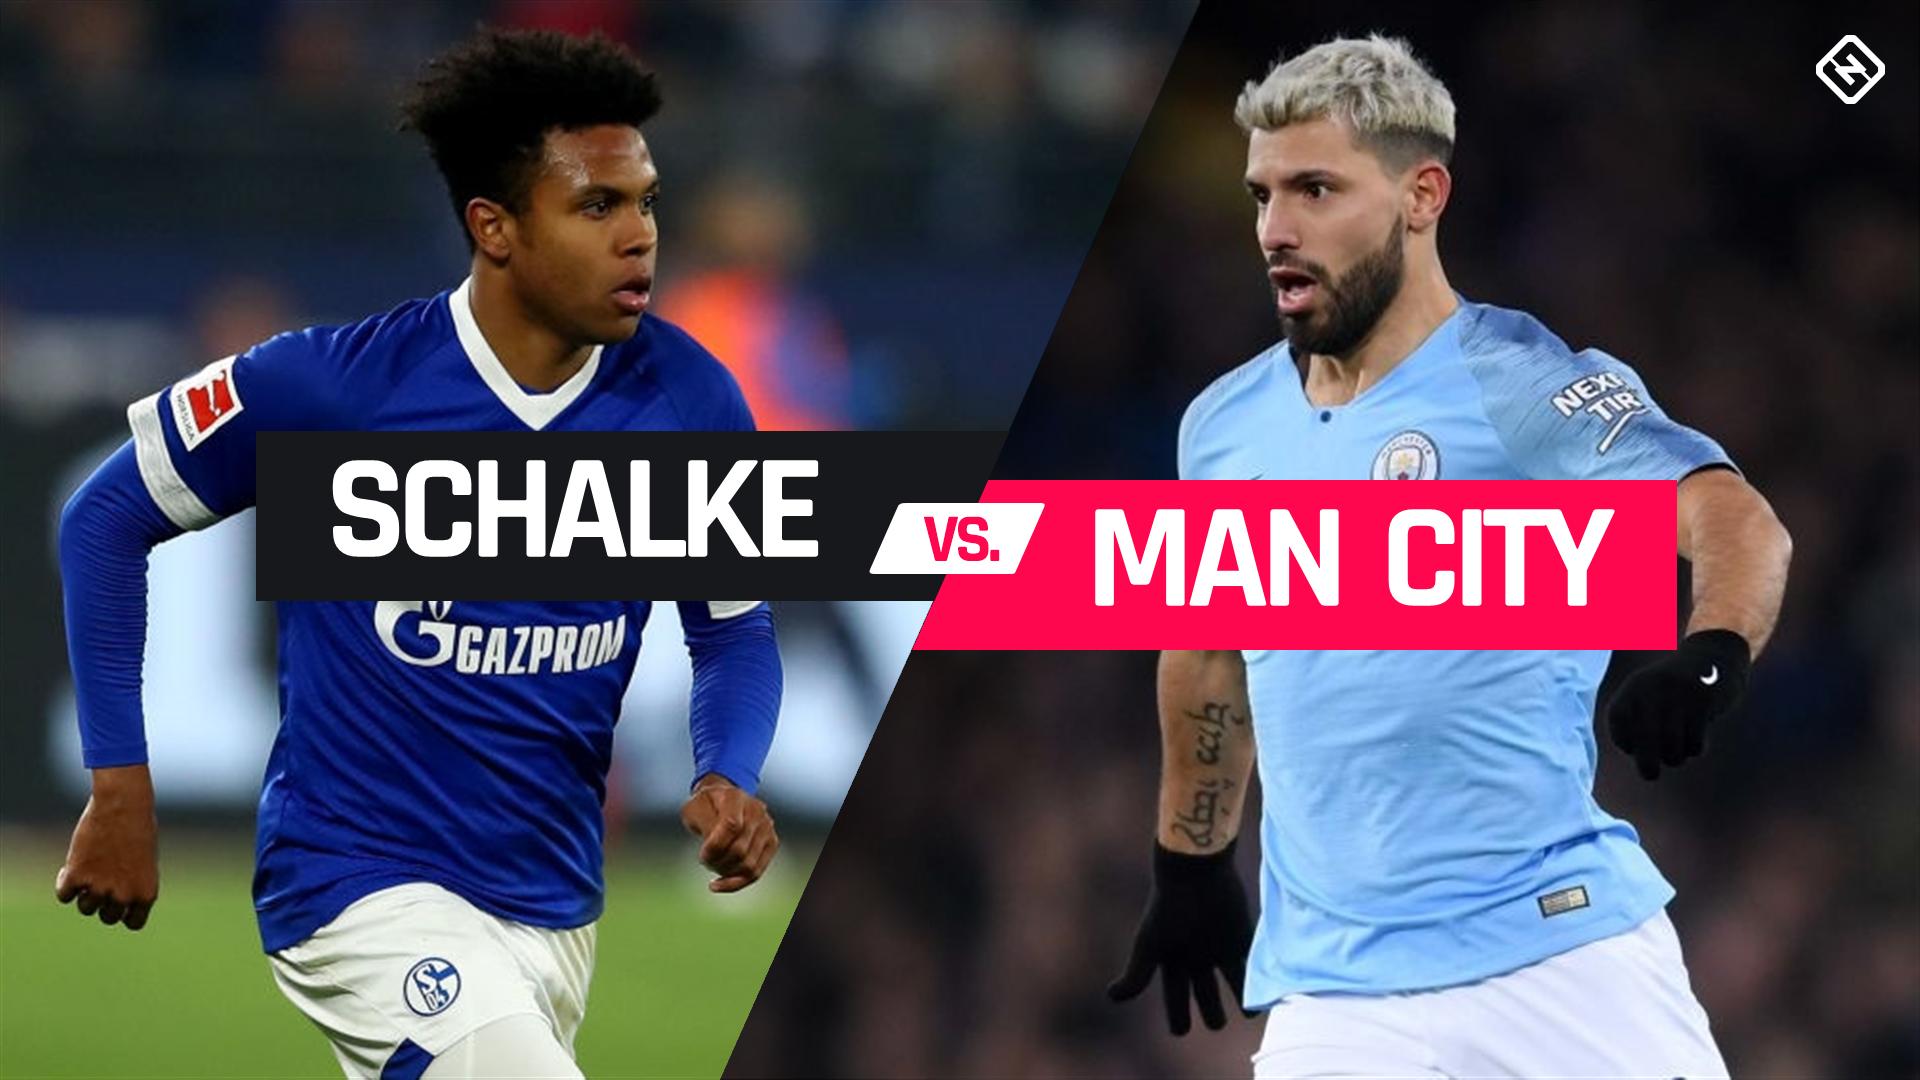 Schalke 04 vs Man City: San phẳng Veltins-Arena